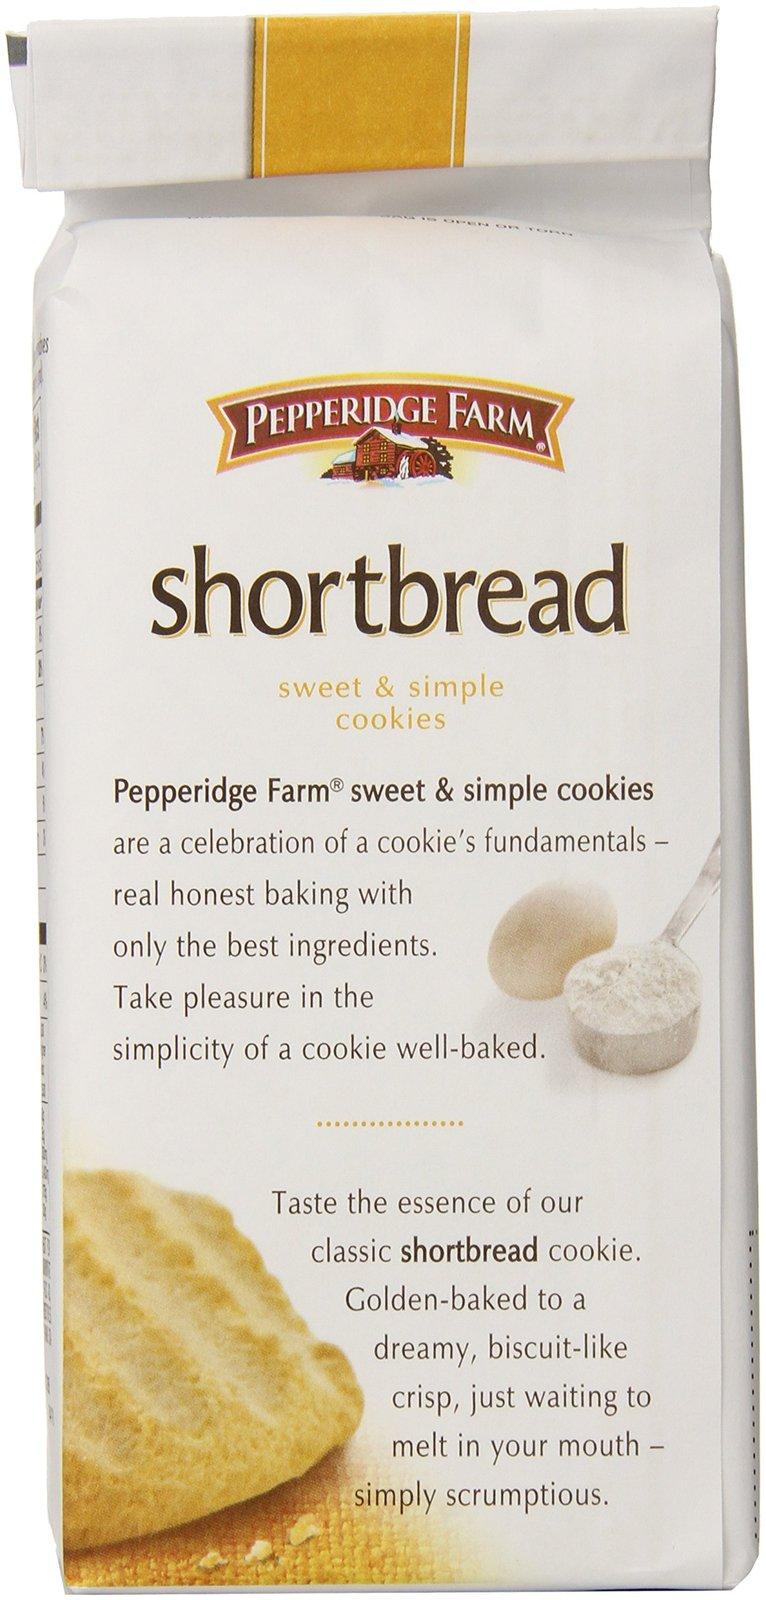 Pepperidge Farm Shortbread Cookies, 5.5 oz. Bag image 4